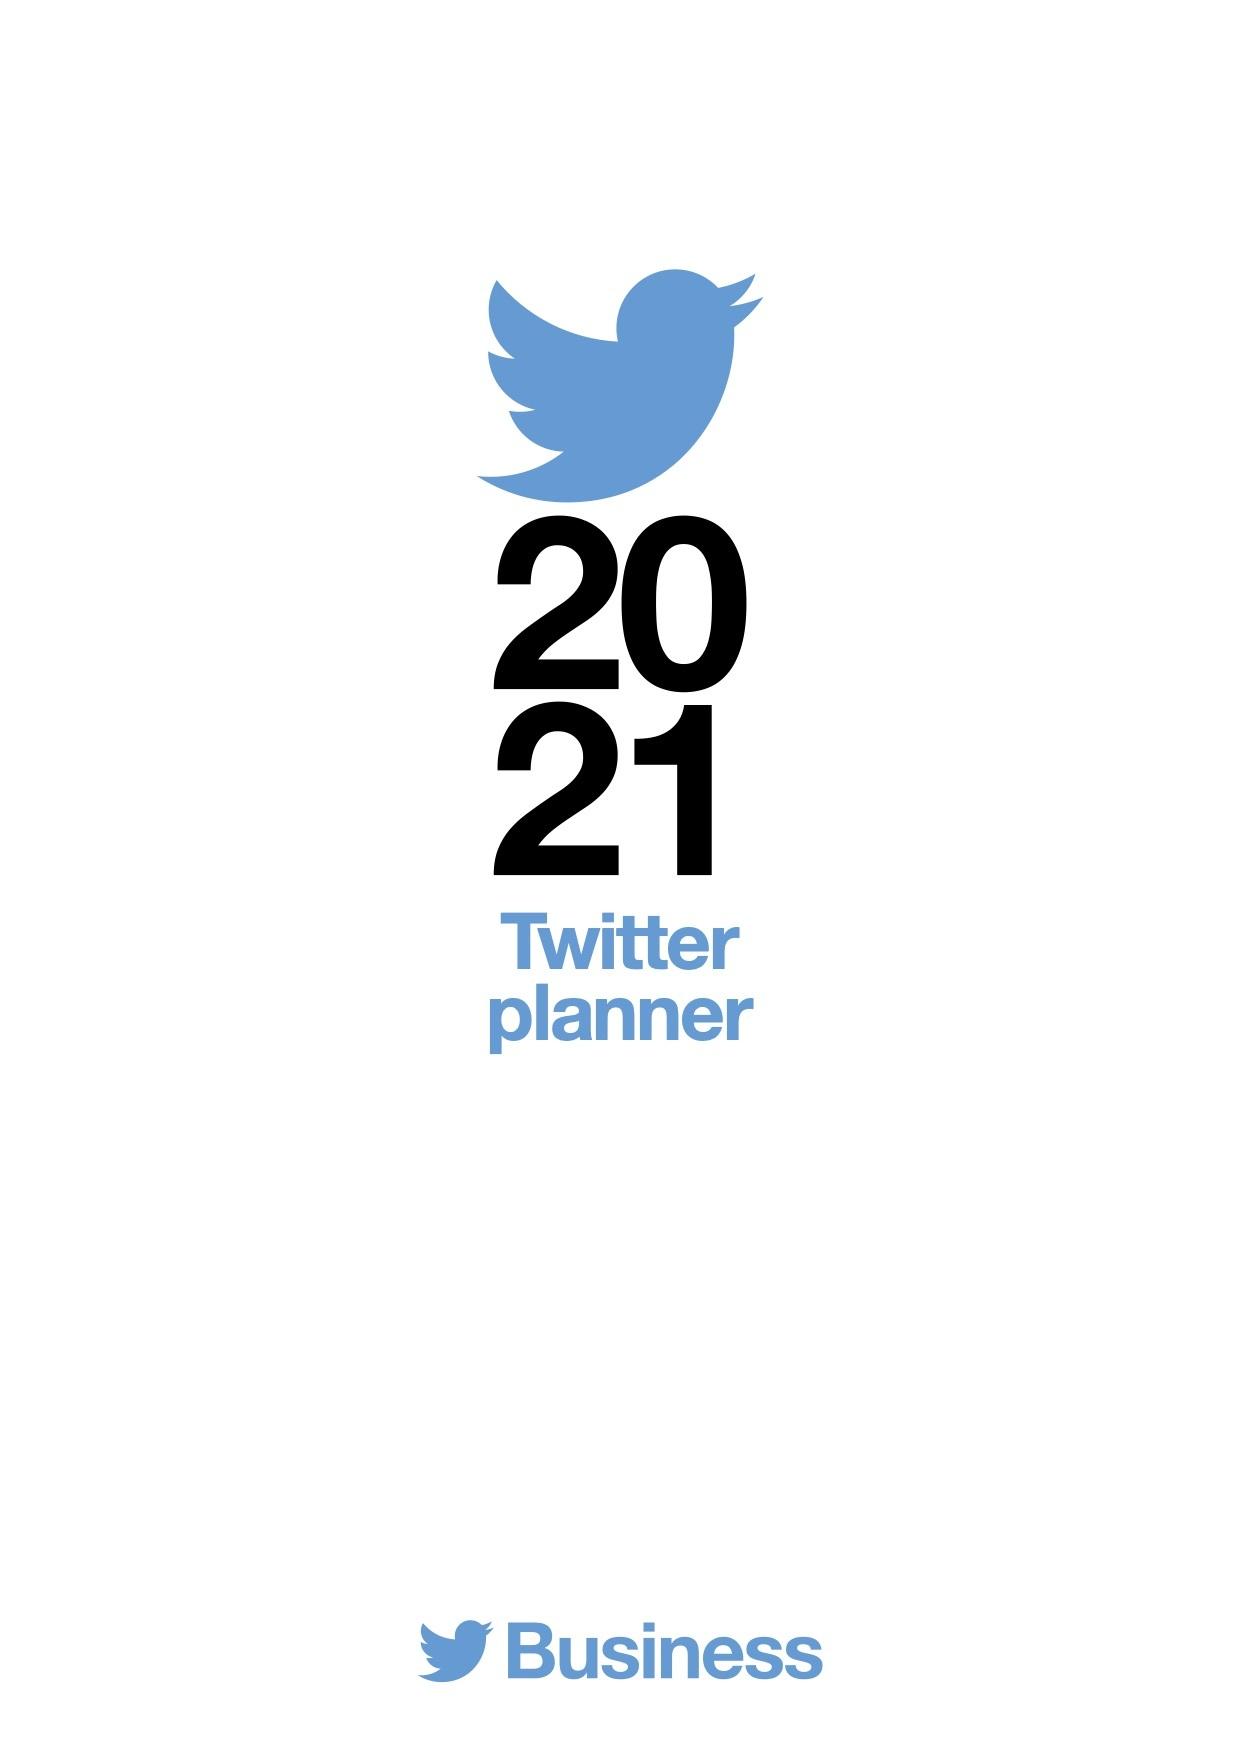 Twitter planner 2021